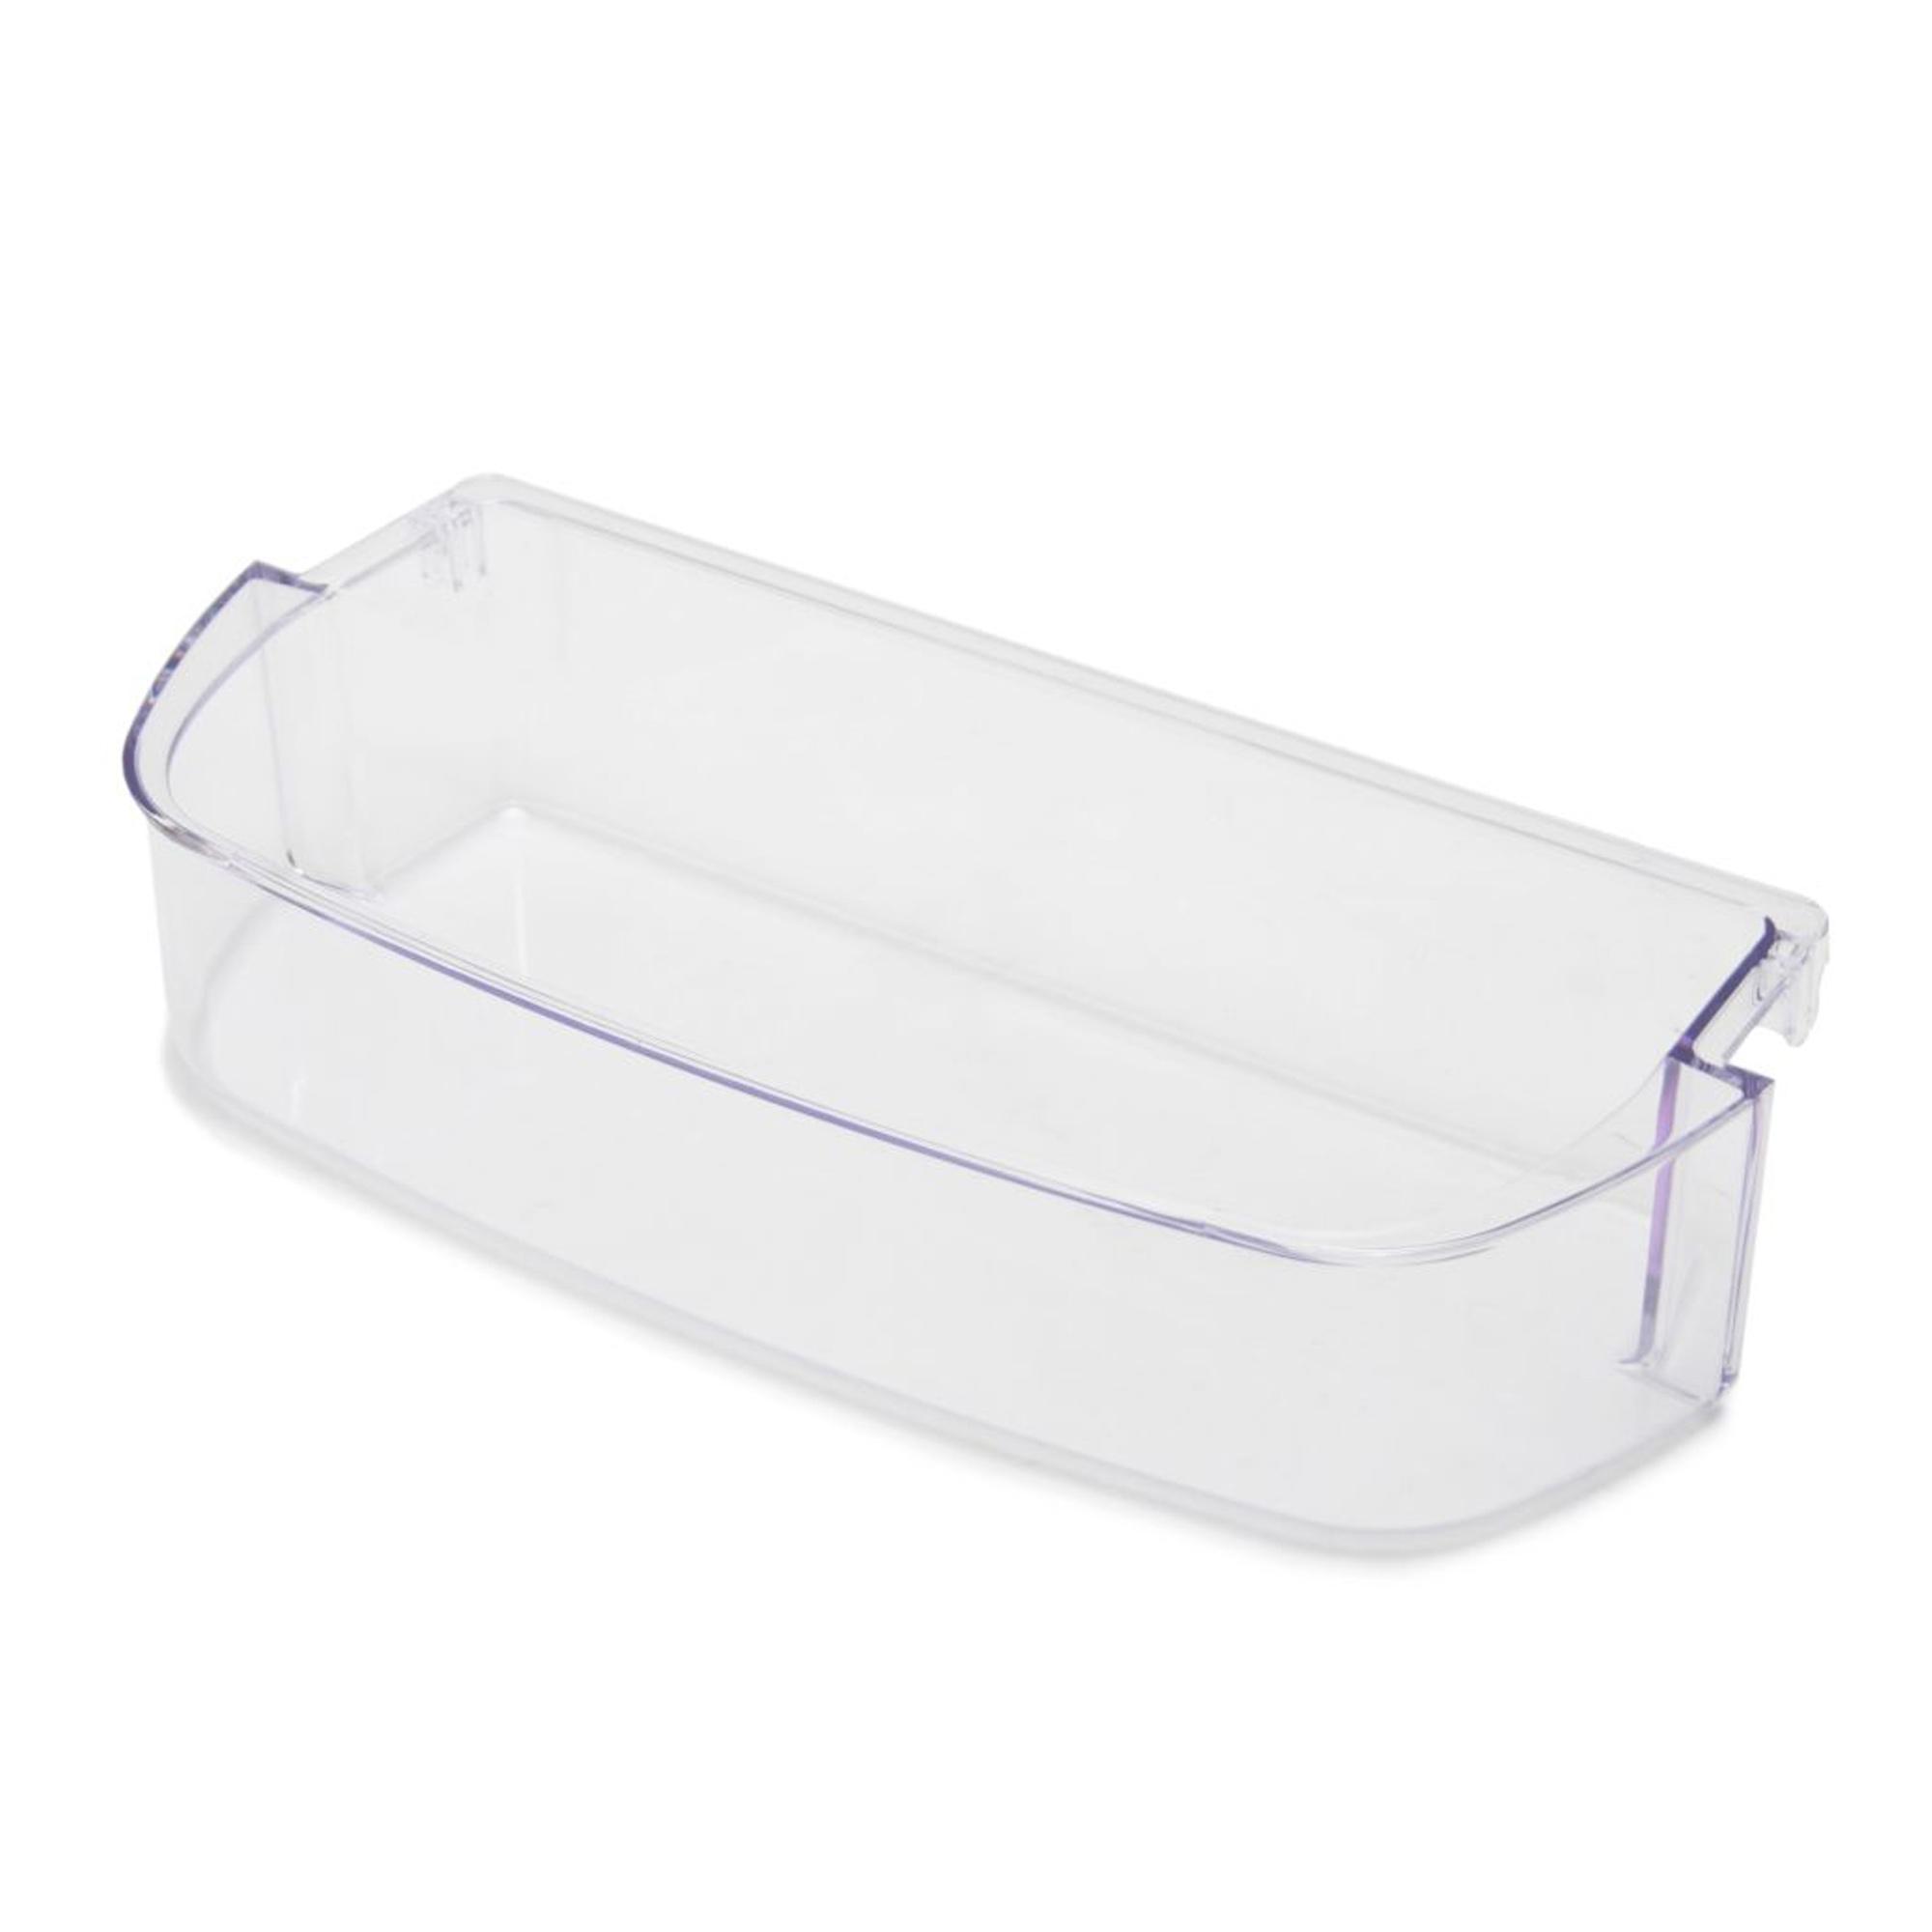 wpw10451873 for whirlpool refrigerator door shelf bin ebay. Black Bedroom Furniture Sets. Home Design Ideas